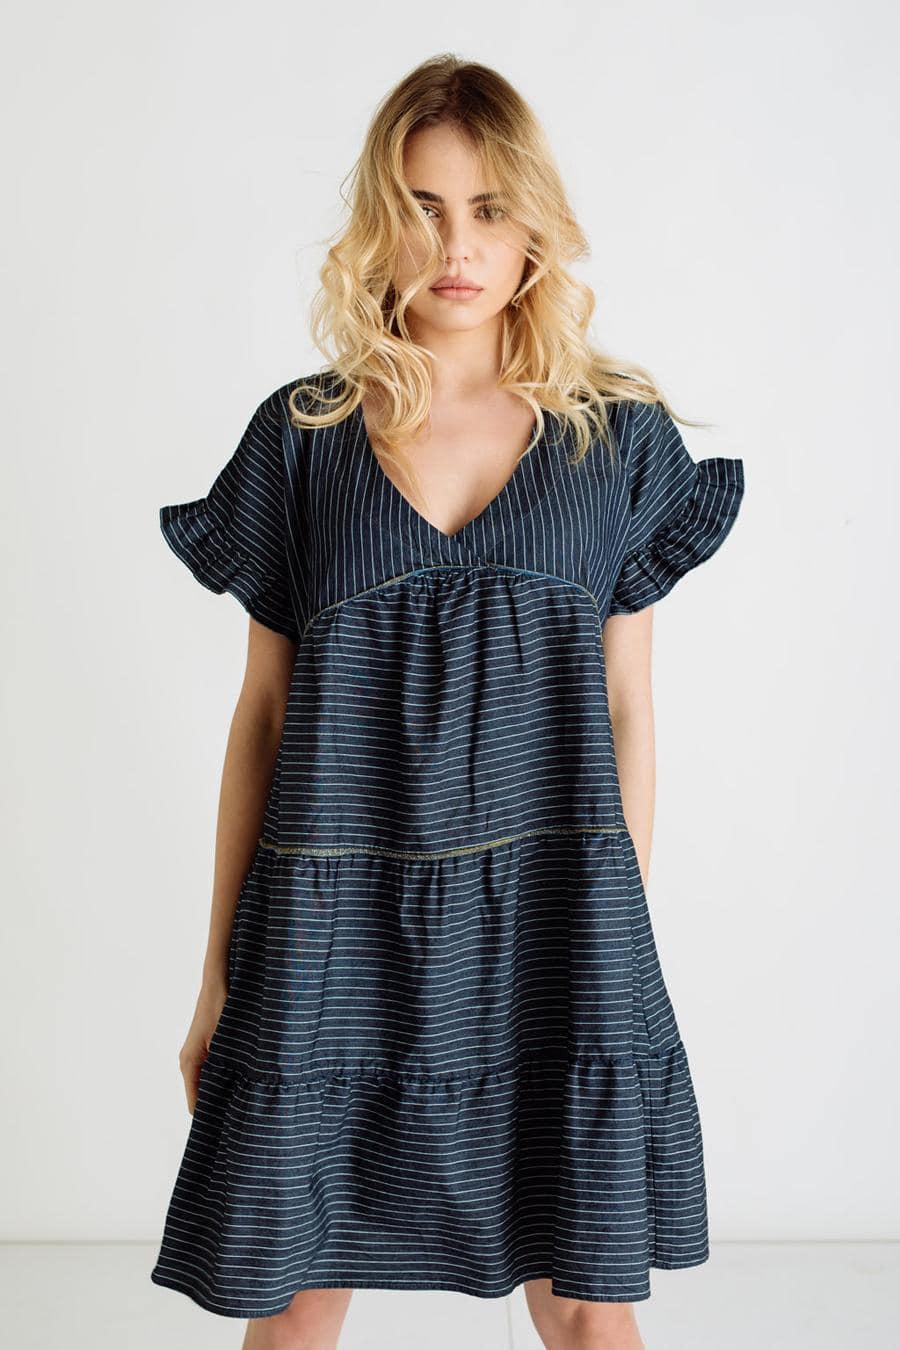 jagger zenska haljina kolekcija prolece leto 2021 ss 2021 kupi online jg 5501 03 4